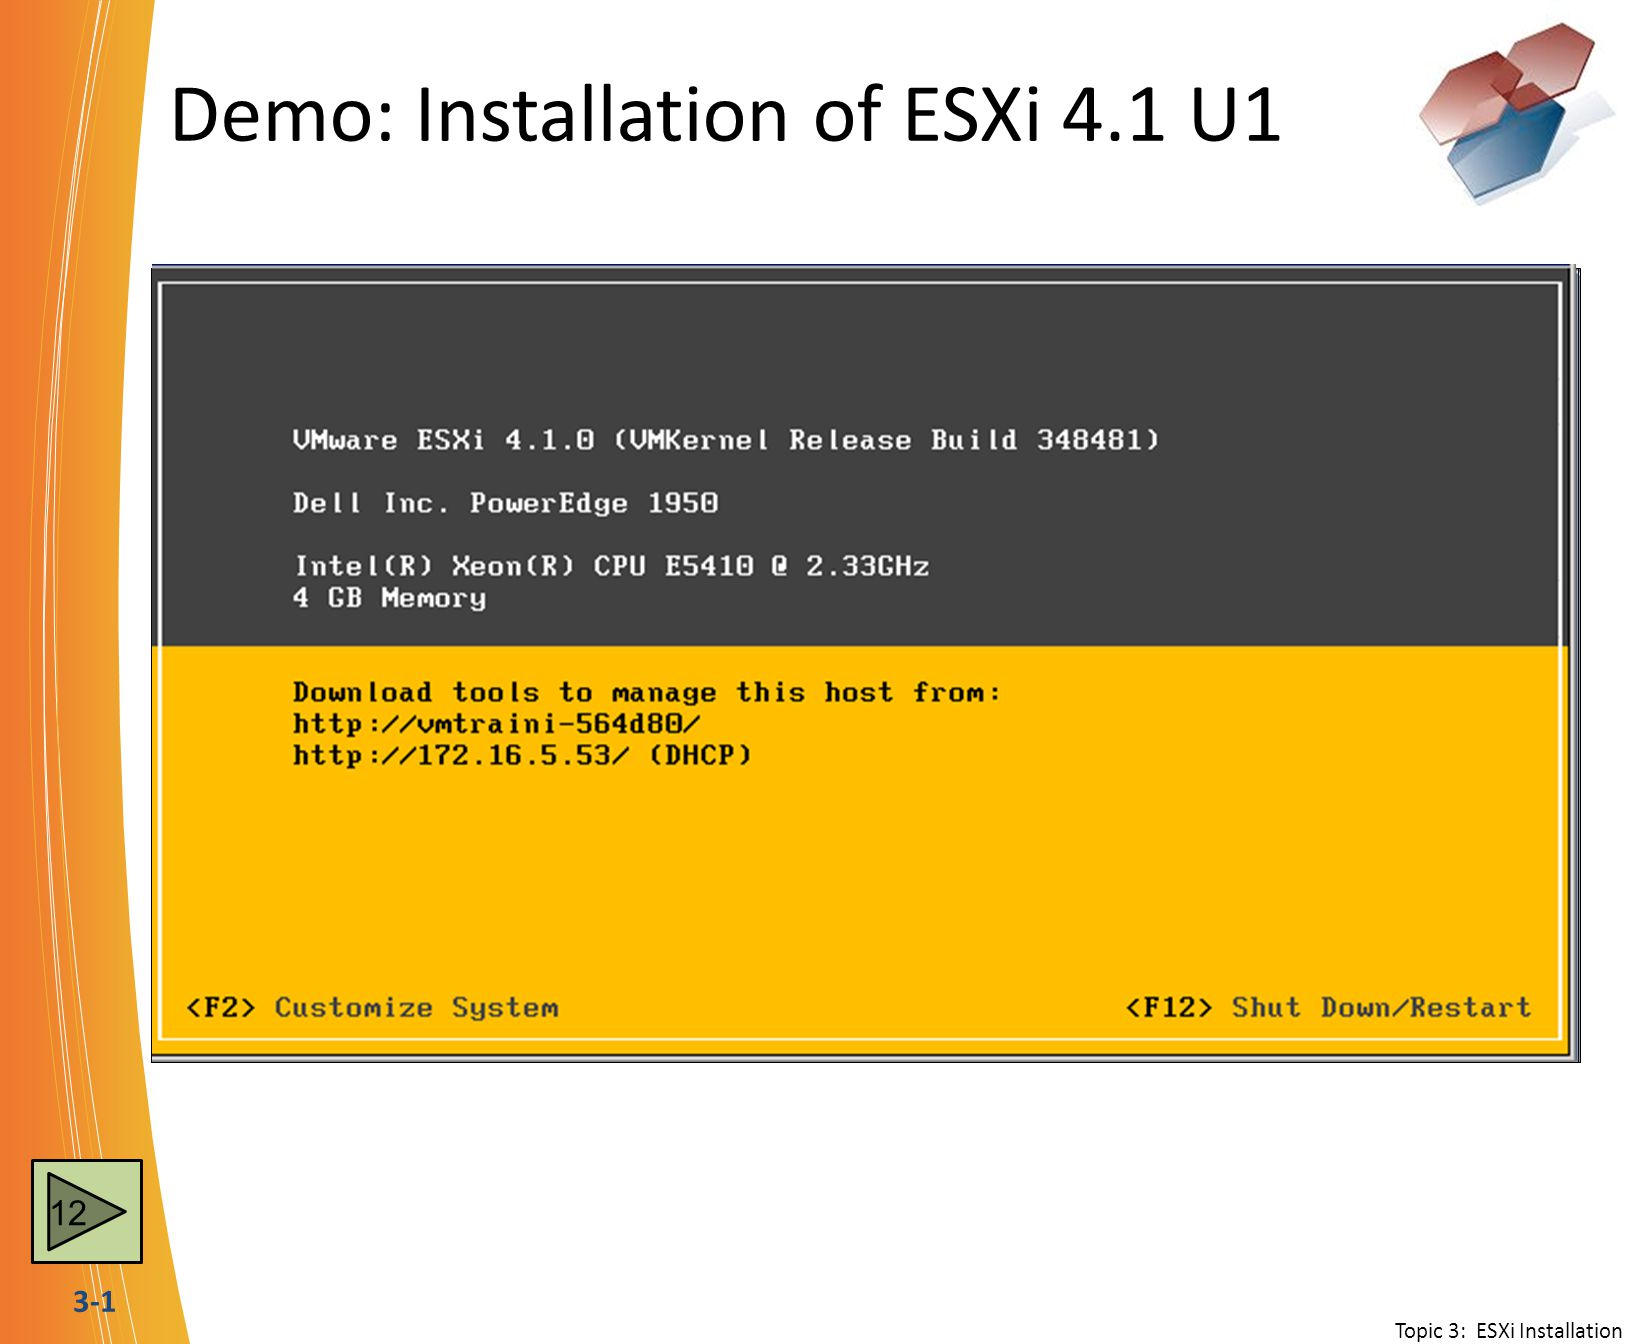 Demo: Installation of ESXi 4.1 U1